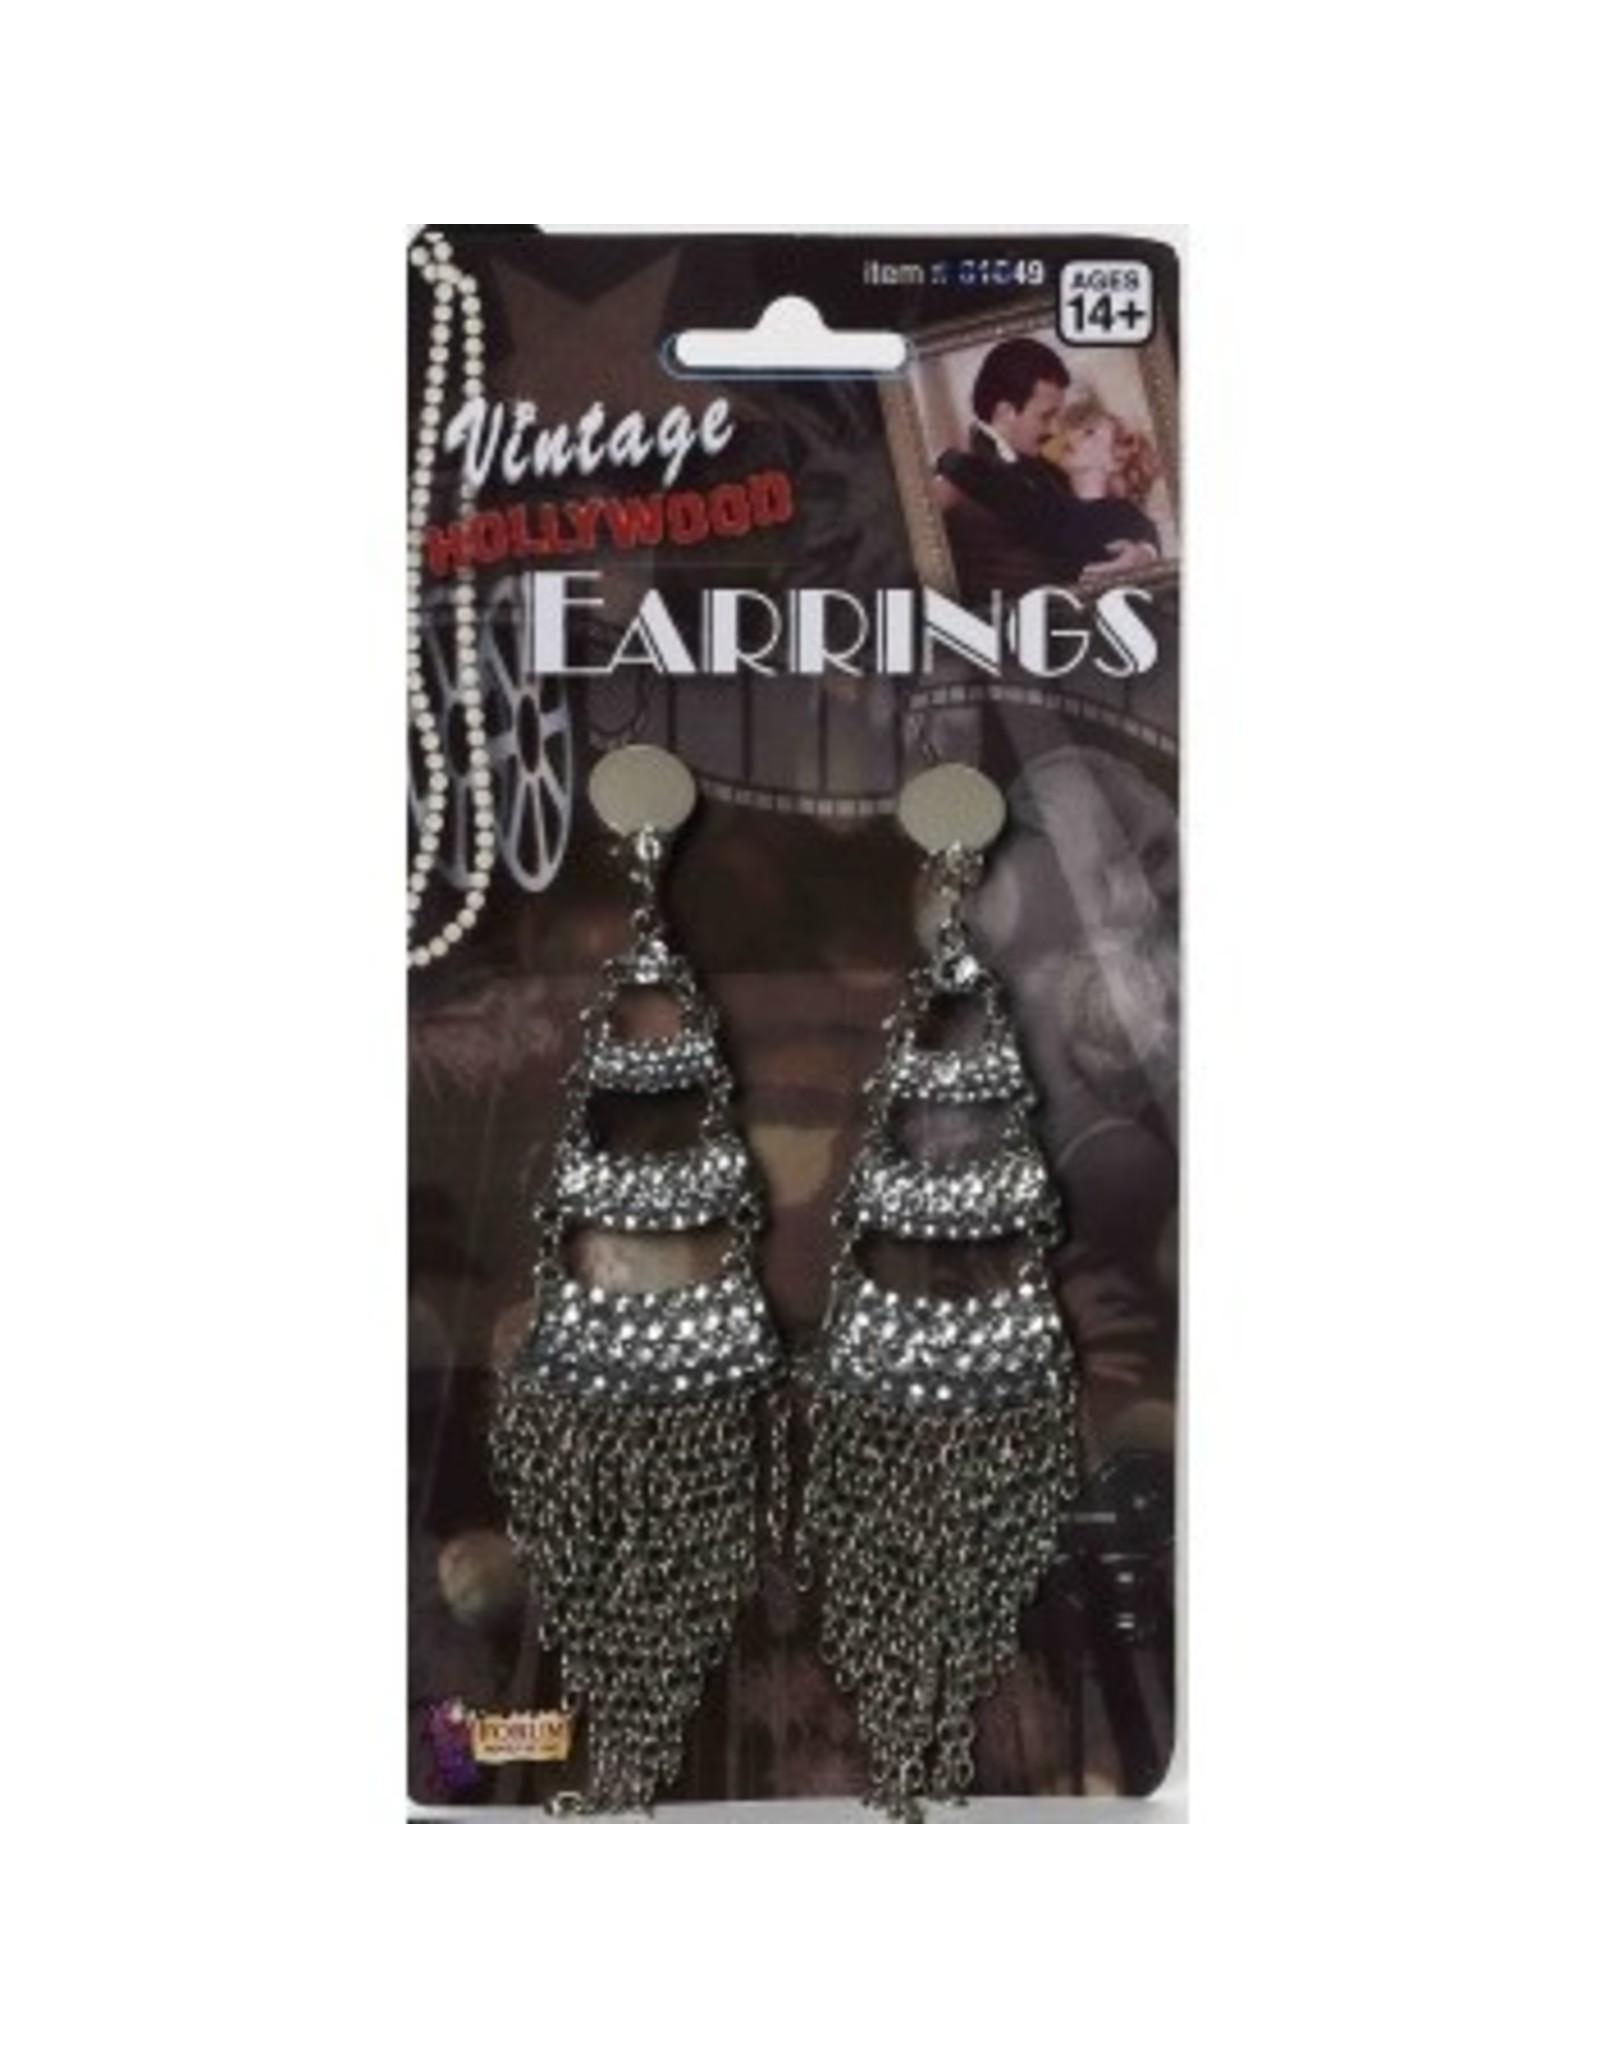 Forum Novelties Inc. Rhinestone and Chains Earrings